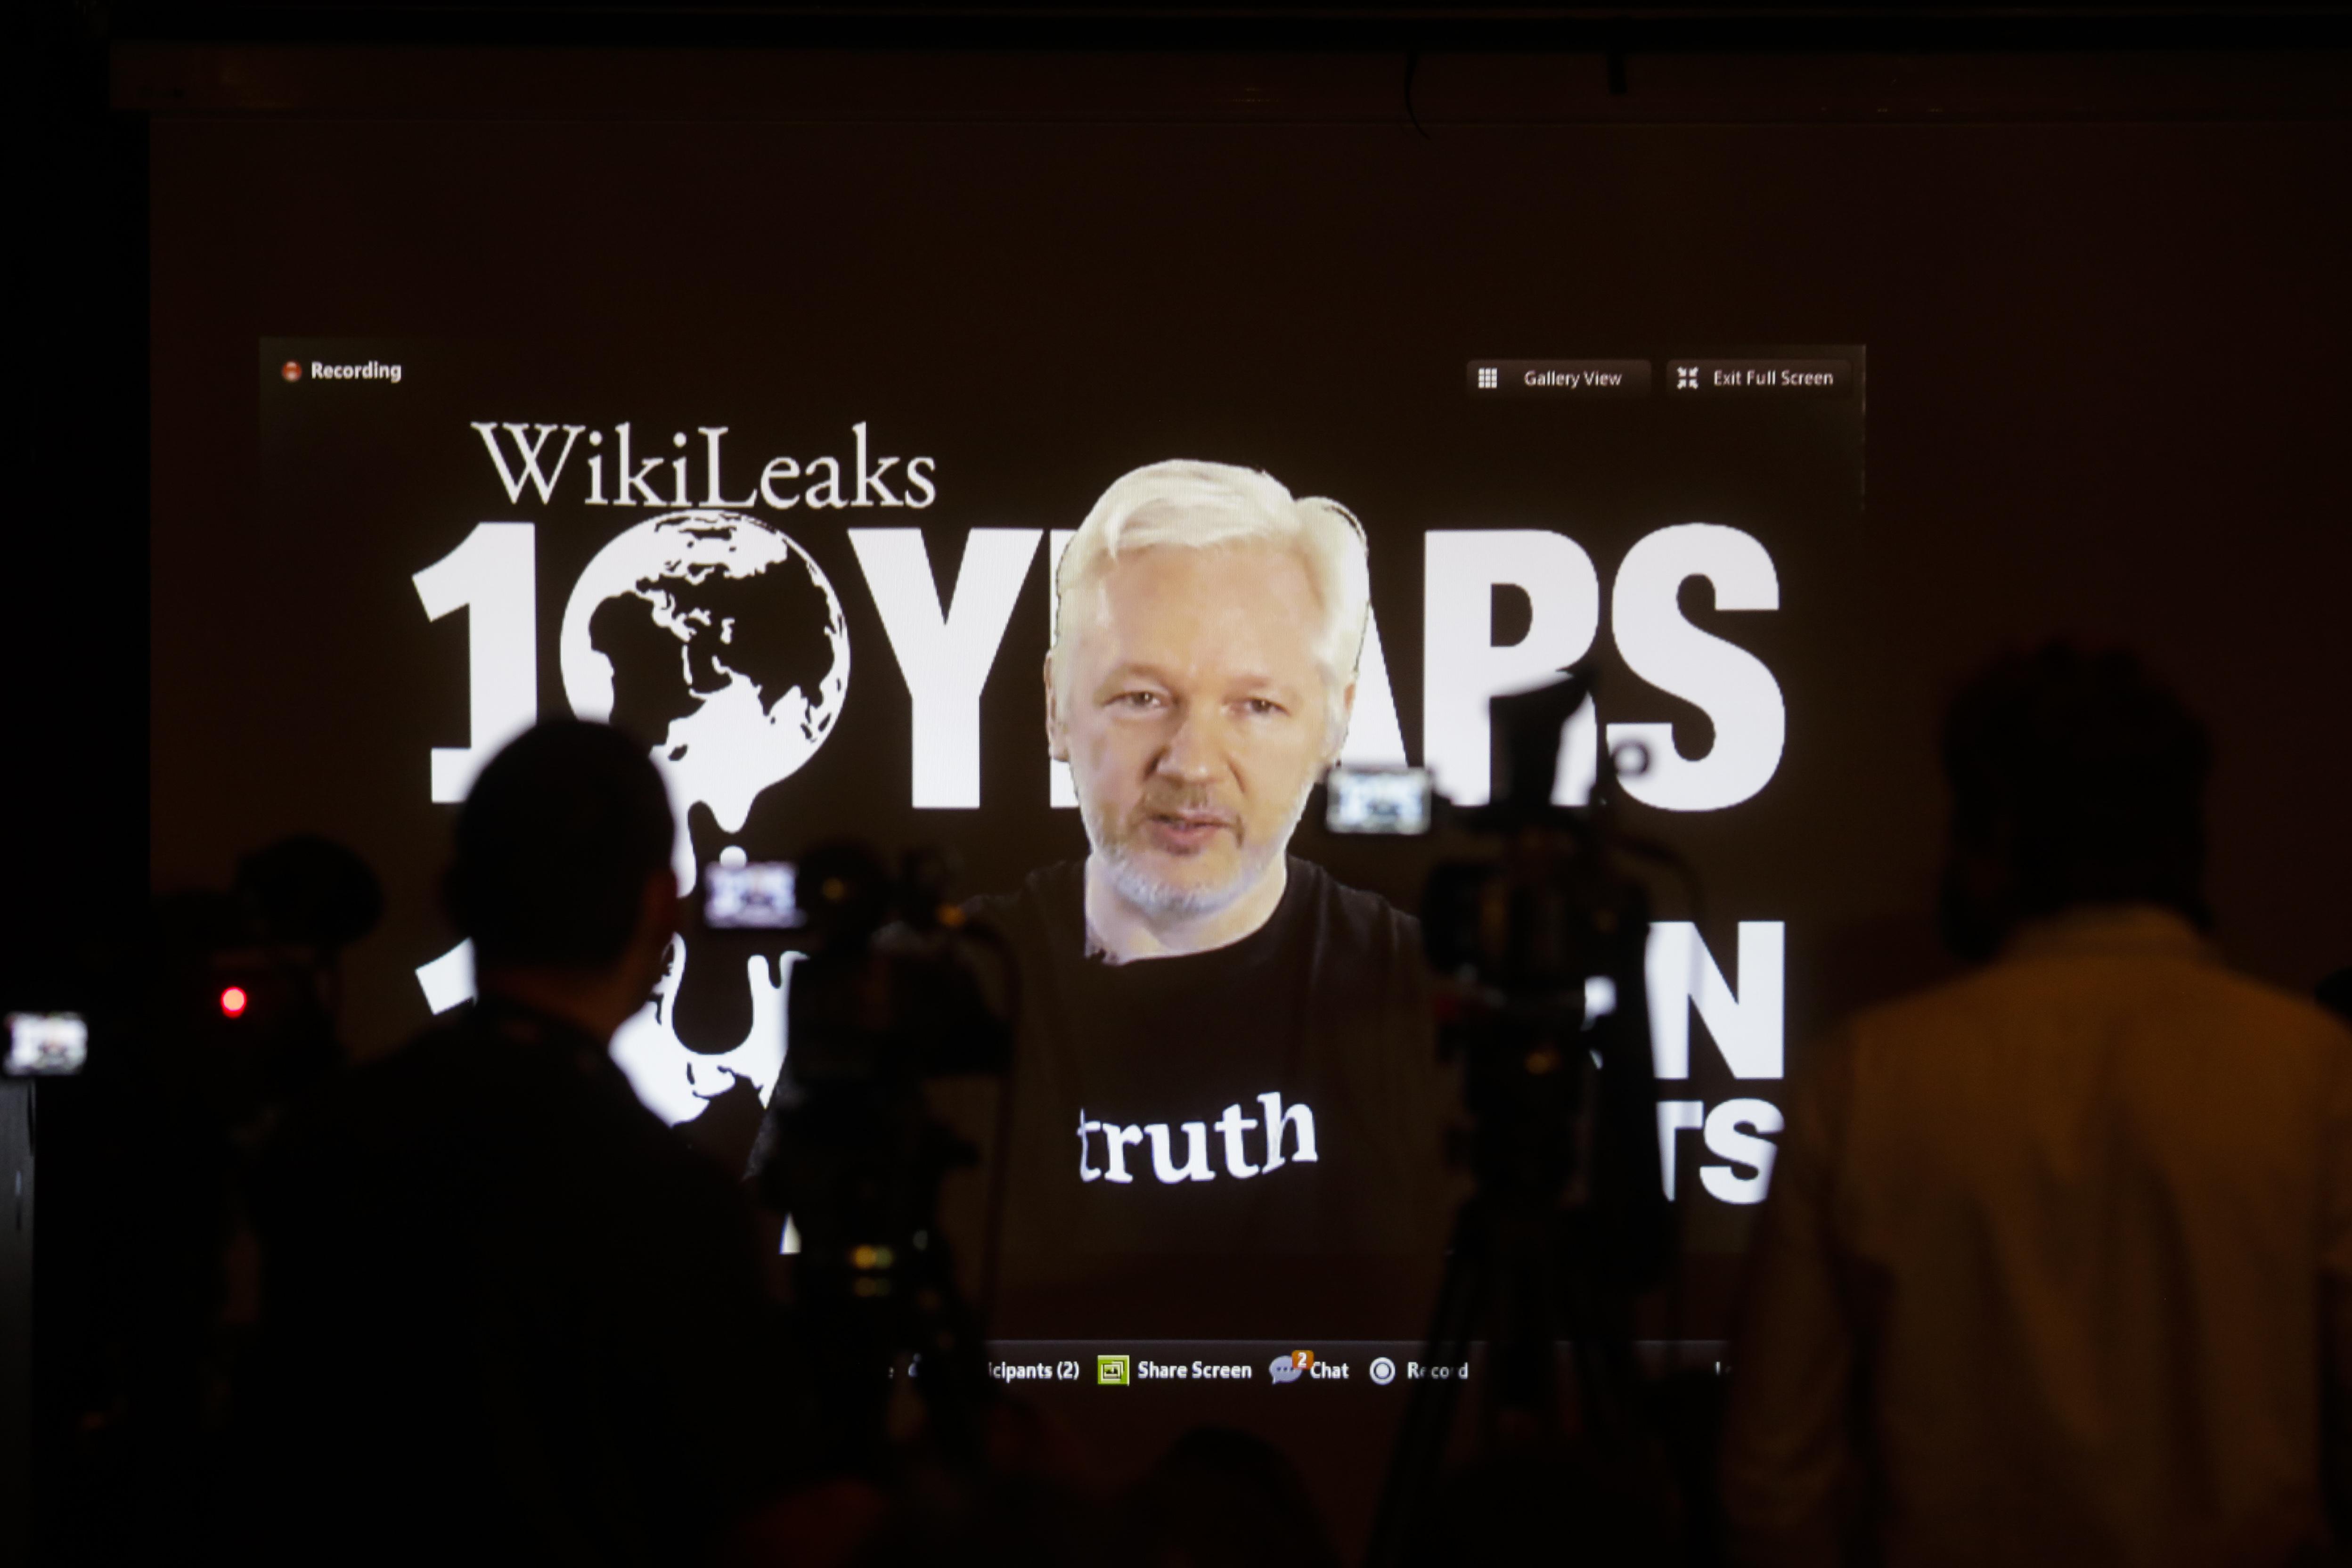 Пет факта за Уикилийкс